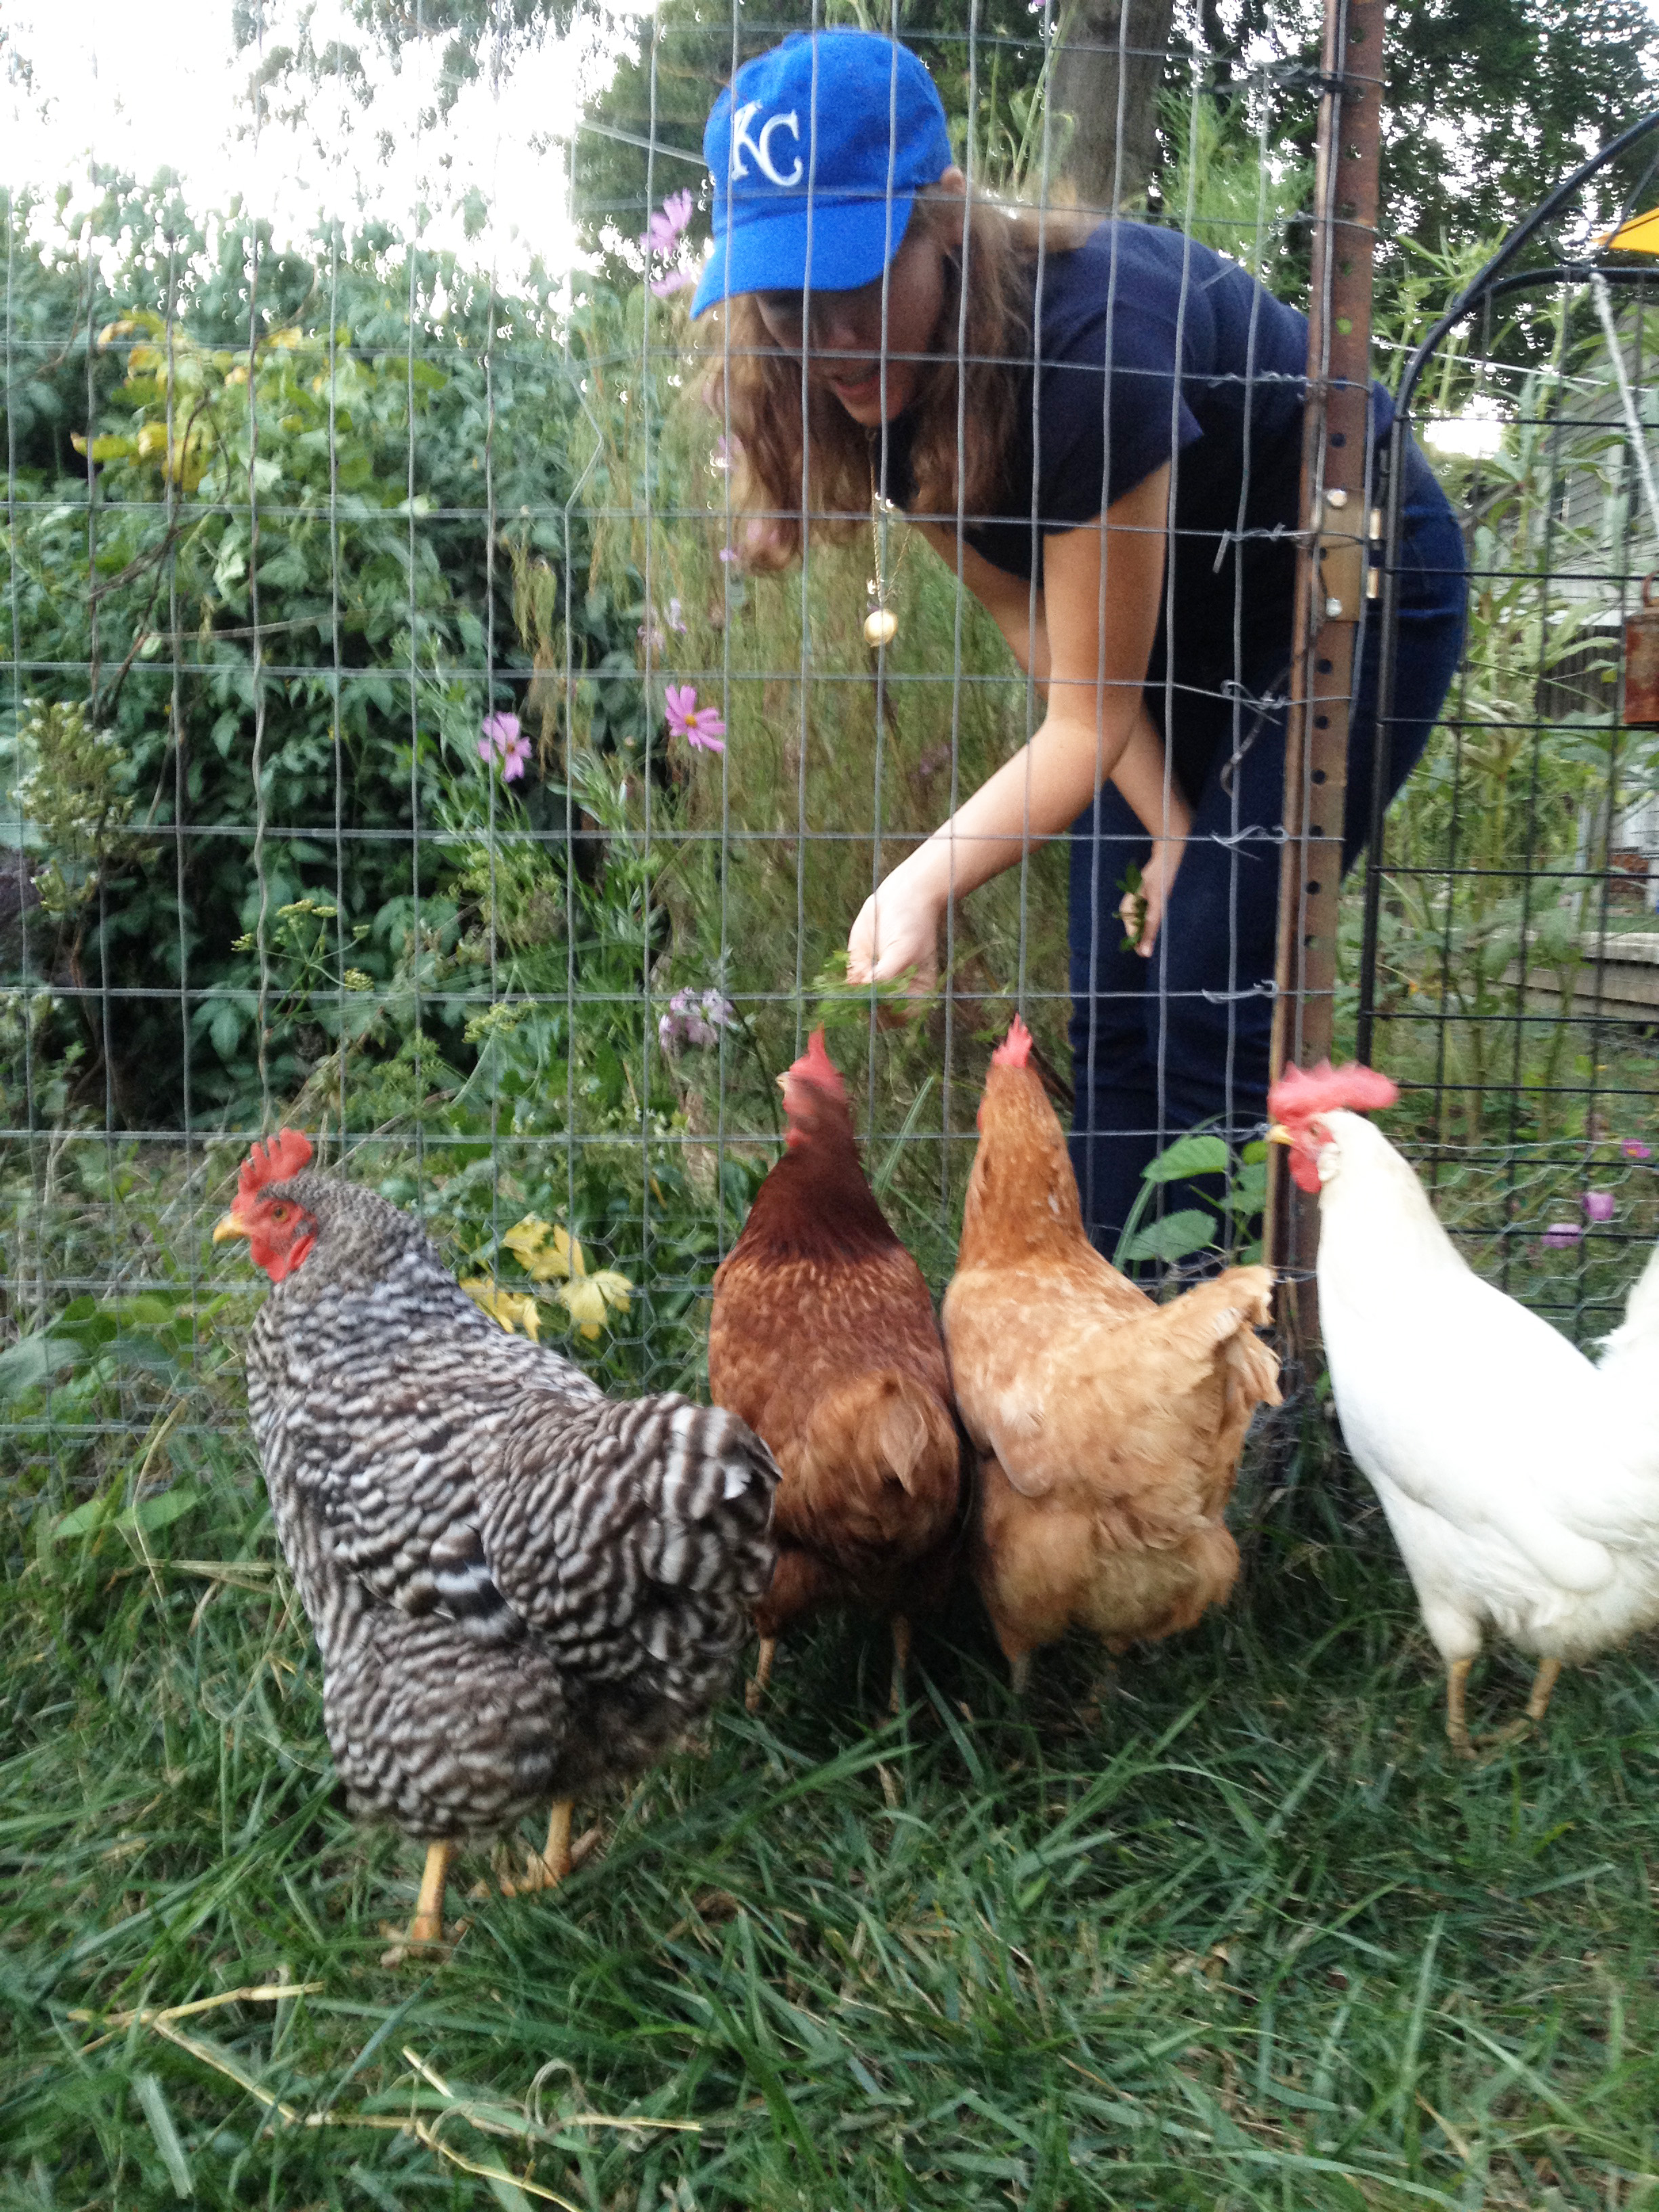 photo of lady feeding four chickens